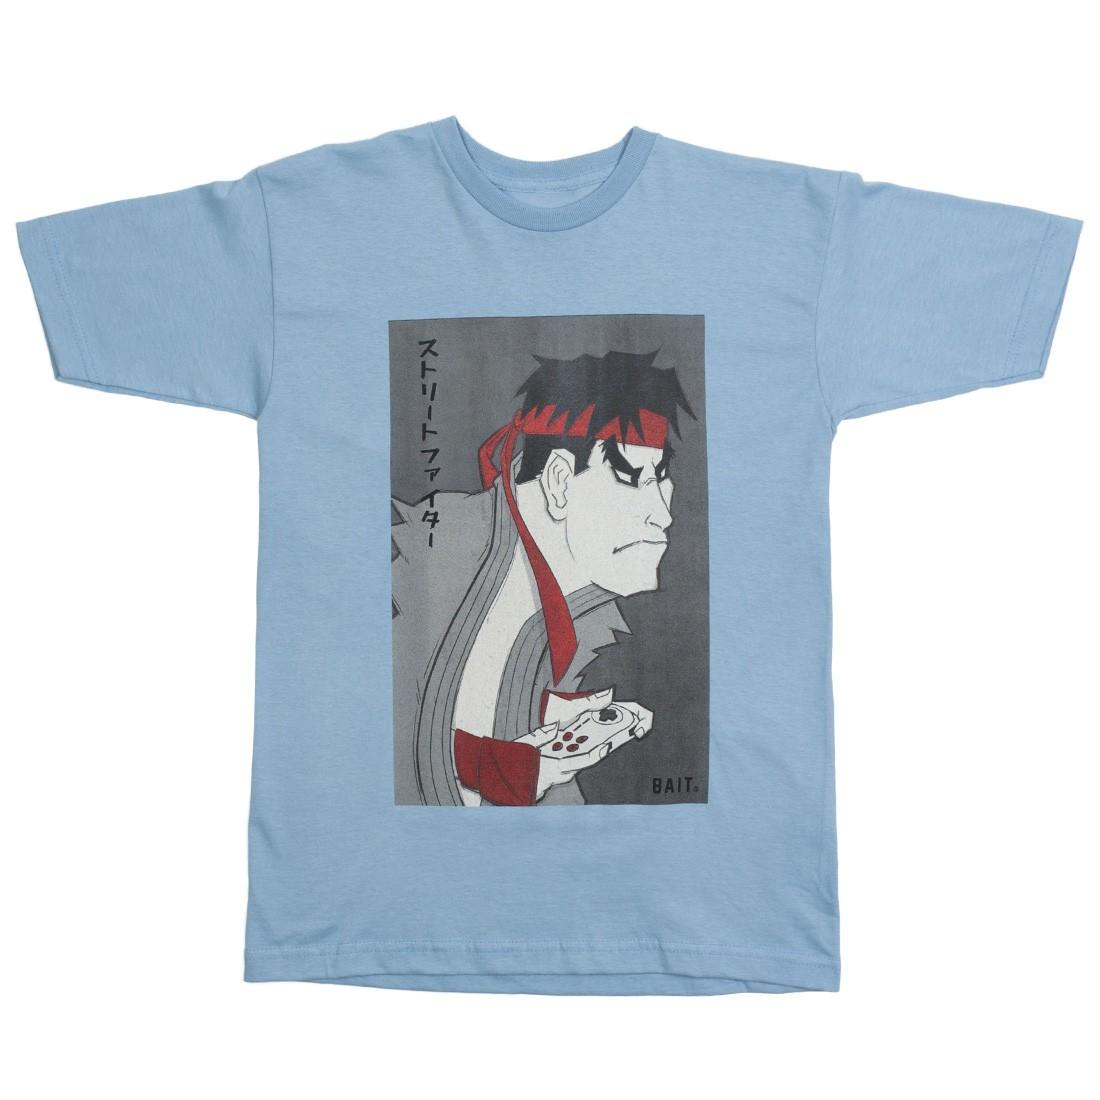 BAIT x Street Fighter x Kidokyo Men Ryu Tee (blue / denim)